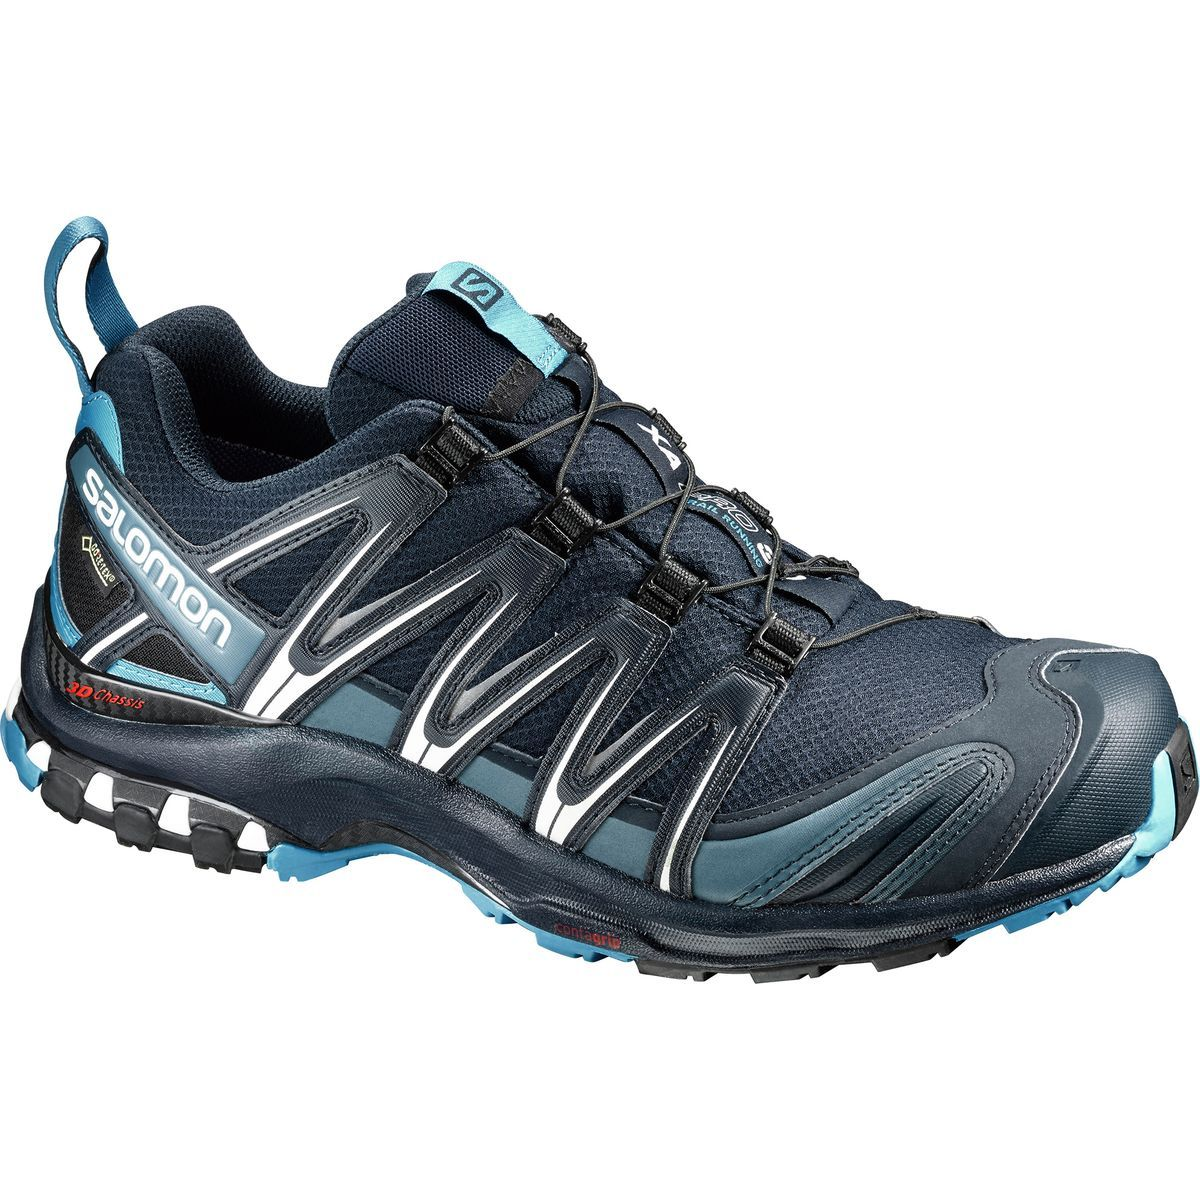 Salomon Xa Pro 3d Gtx Trail Running Shoe Men S In 2020 Mens Trail Running Shoes Best Trail Running Shoes Best Hiking Shoes